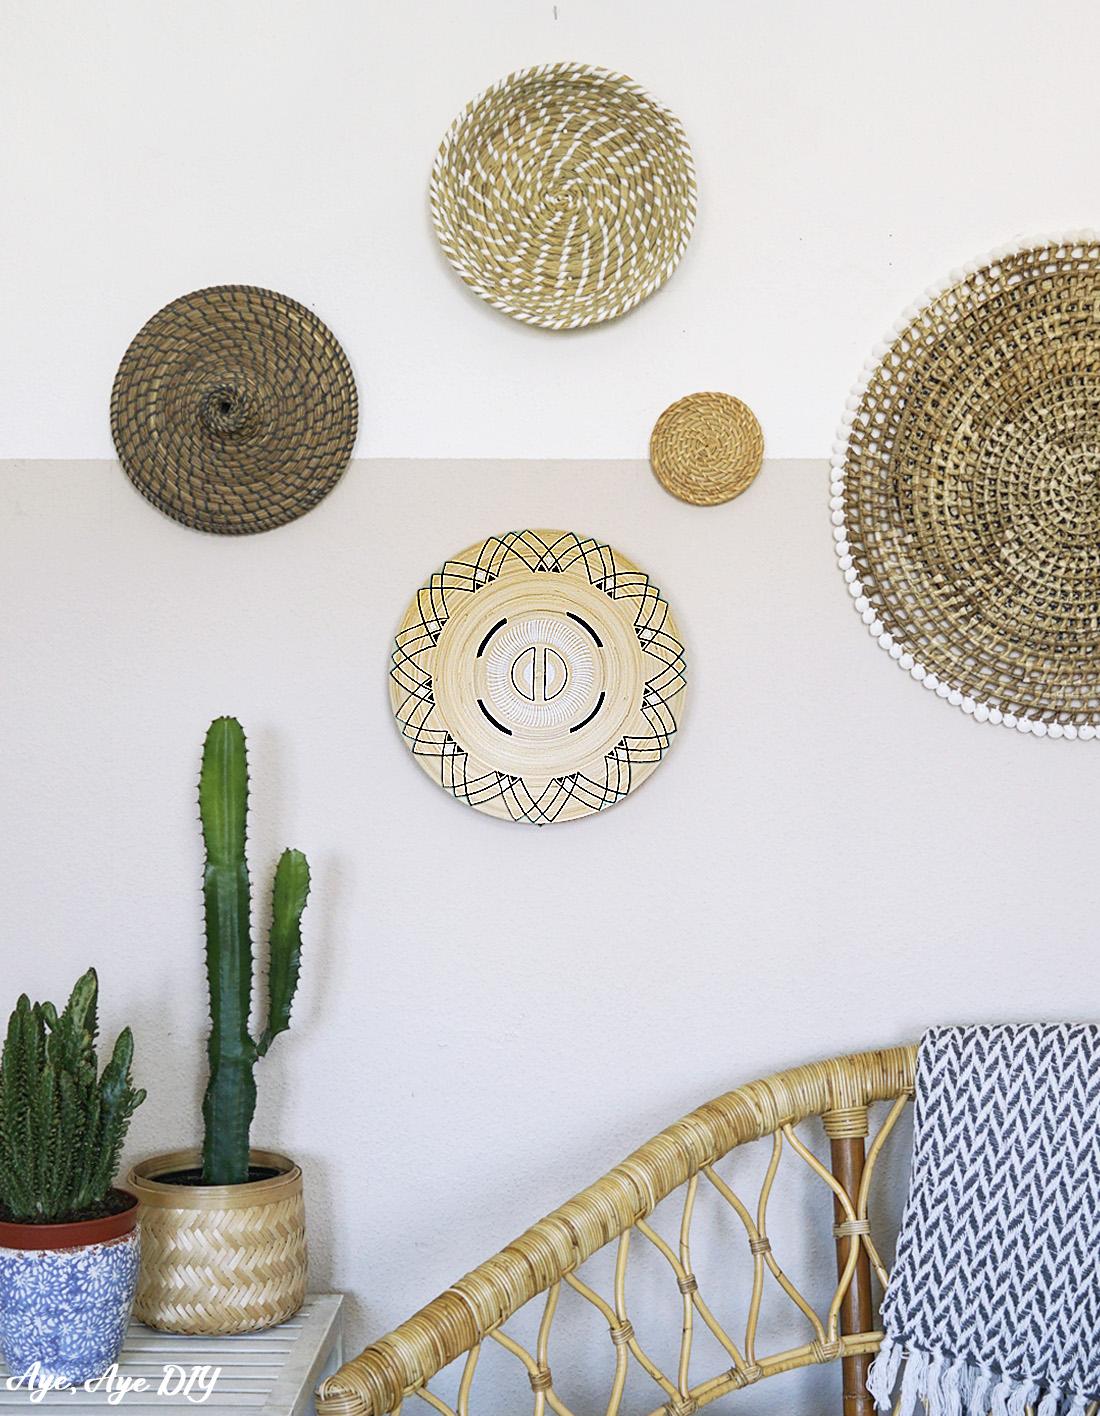 Boho Deko IKEA Hack: Upcycling Bambus Schale mit PINTOR Kreativmarkern